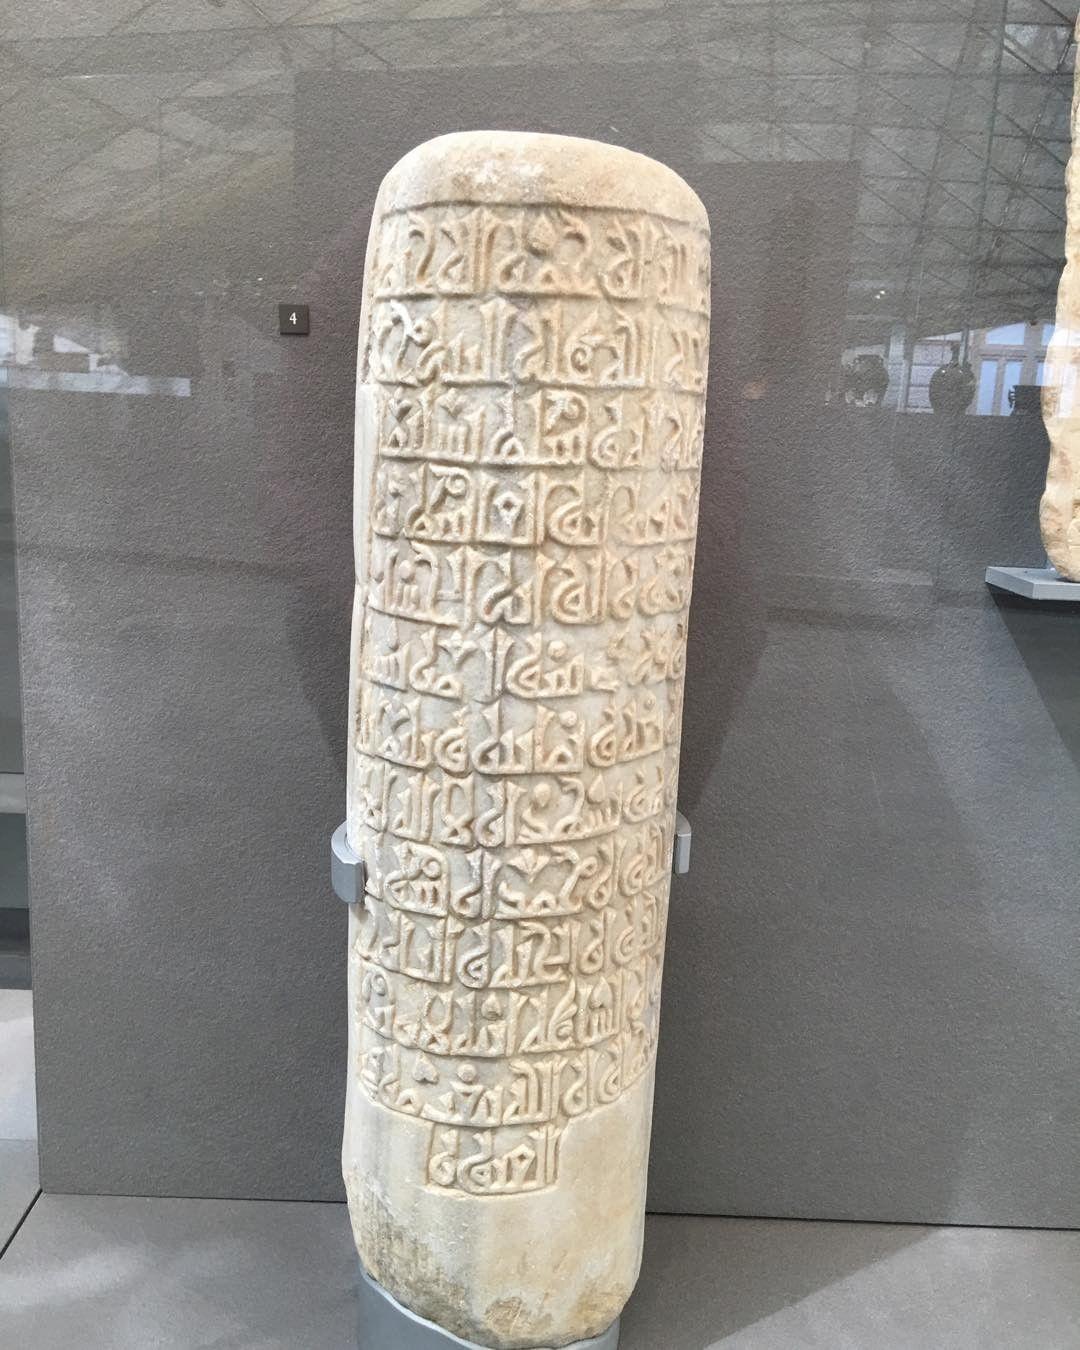 Khat Diwani Ajhalawani/Amr شاهد قبر وجد في تونس في القرن الرابع من الهجرة. #متحف_اللوفر #باريس #فرنسا #الخط… 26